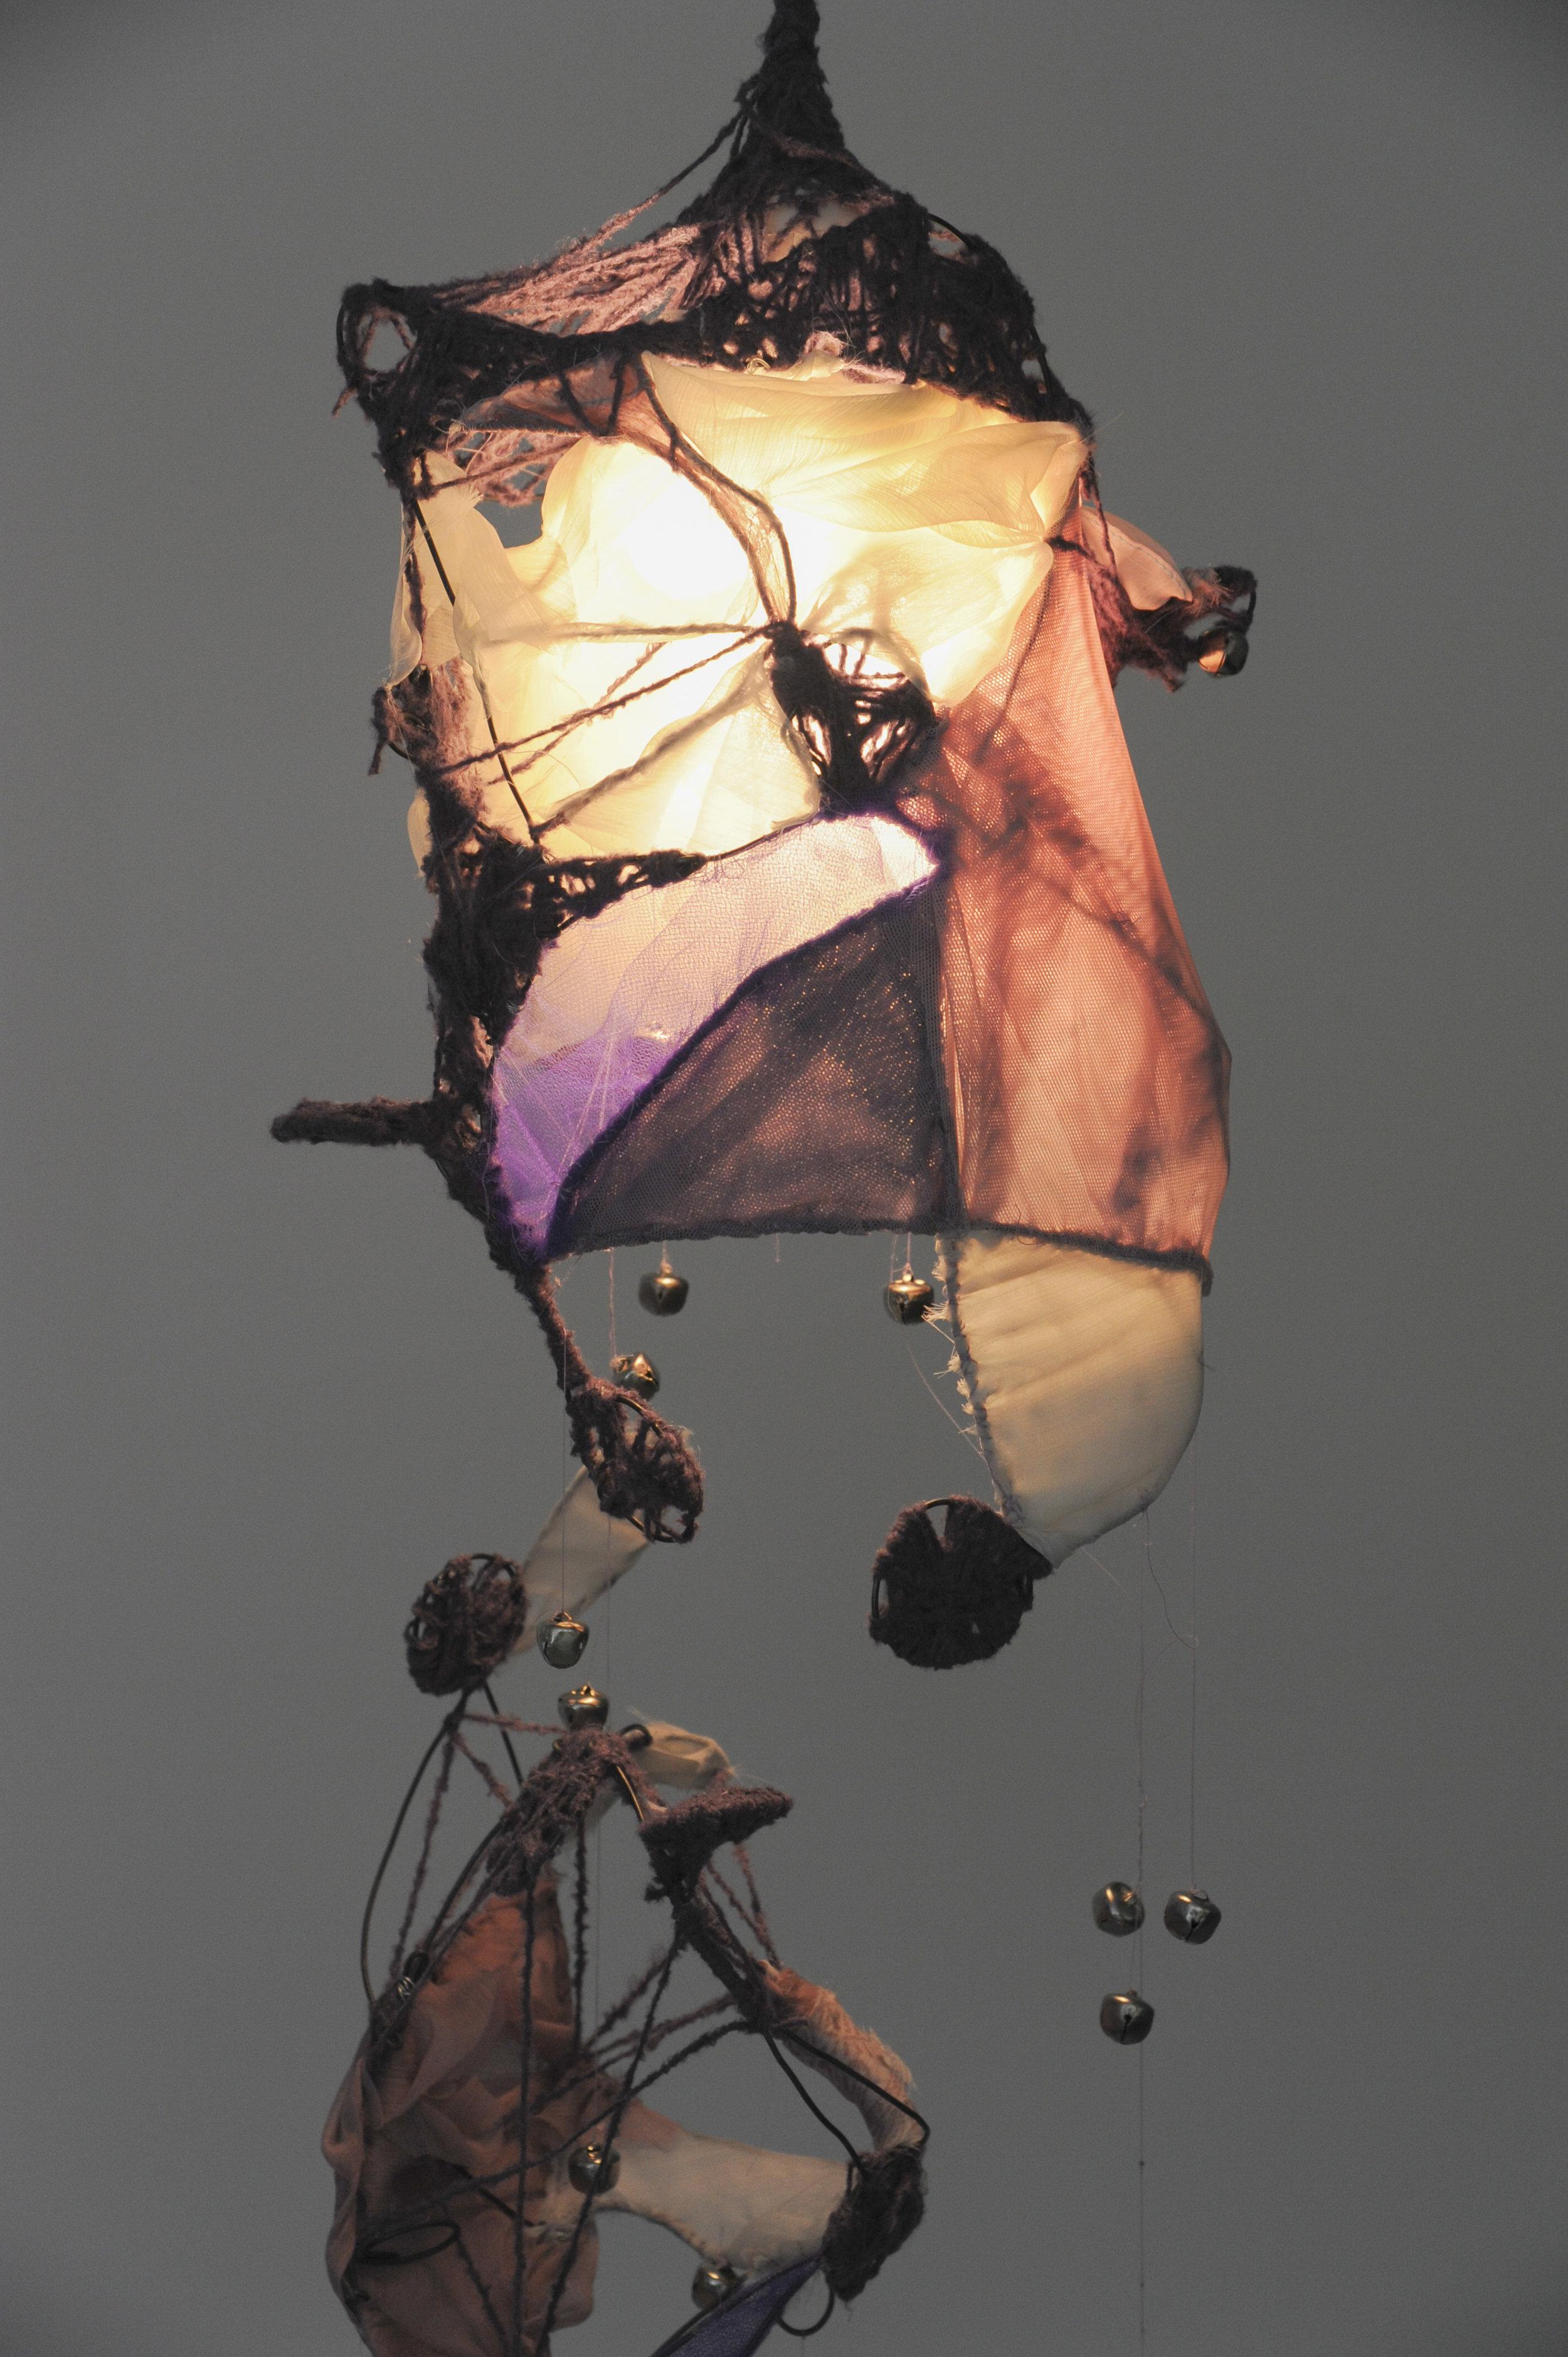 Iman Serag ,  Musical Lights , 2015  Elastic fabric, thread, jingle bells